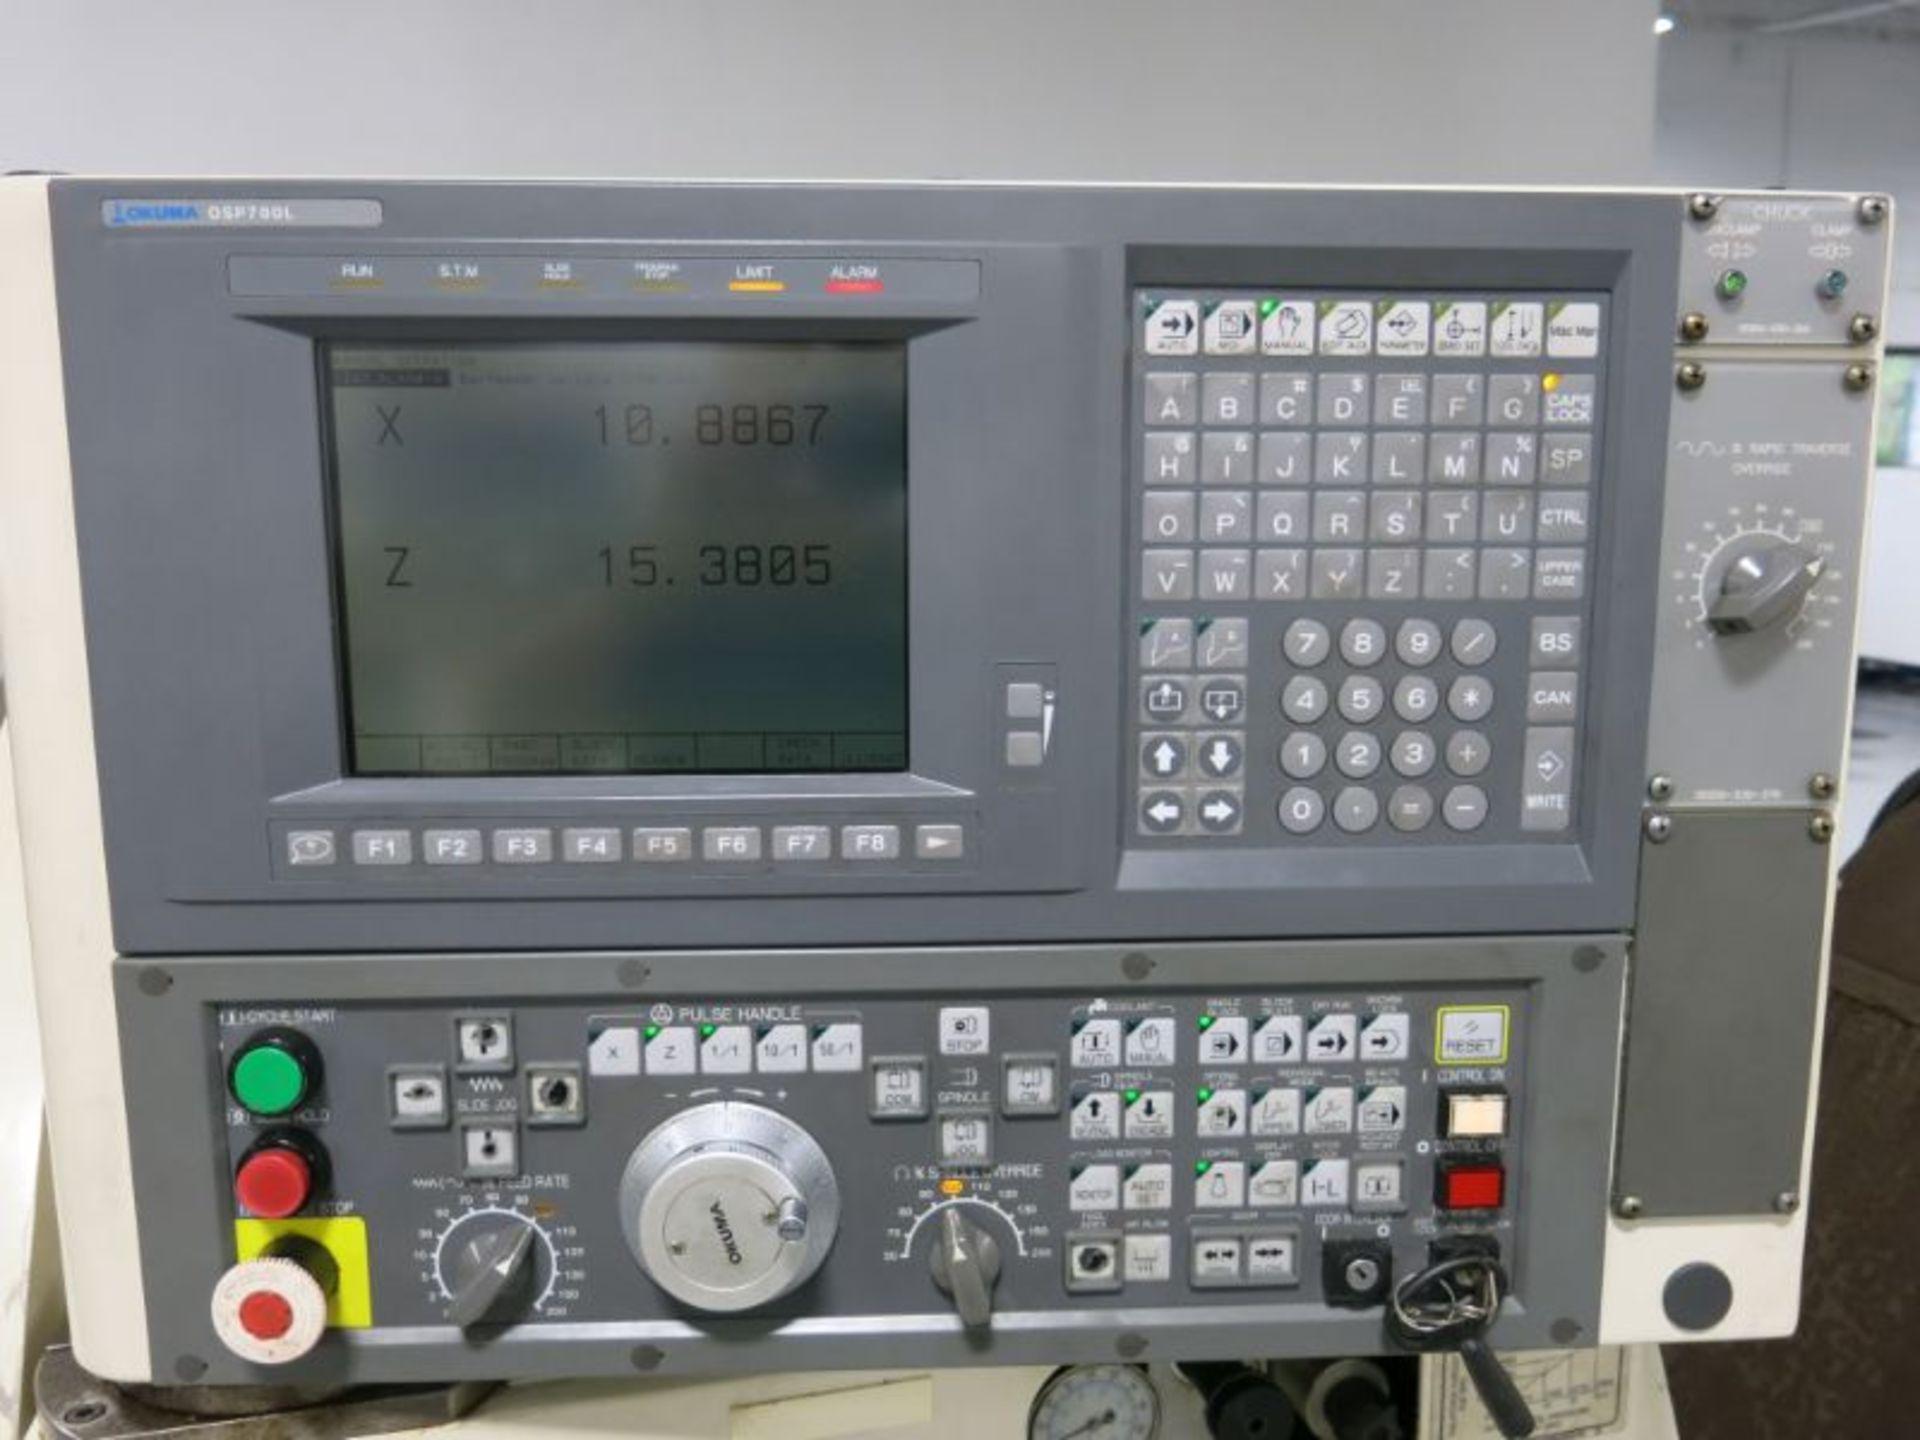 1998 Okuma 762E Crown CNC Turning Center - Image 4 of 5